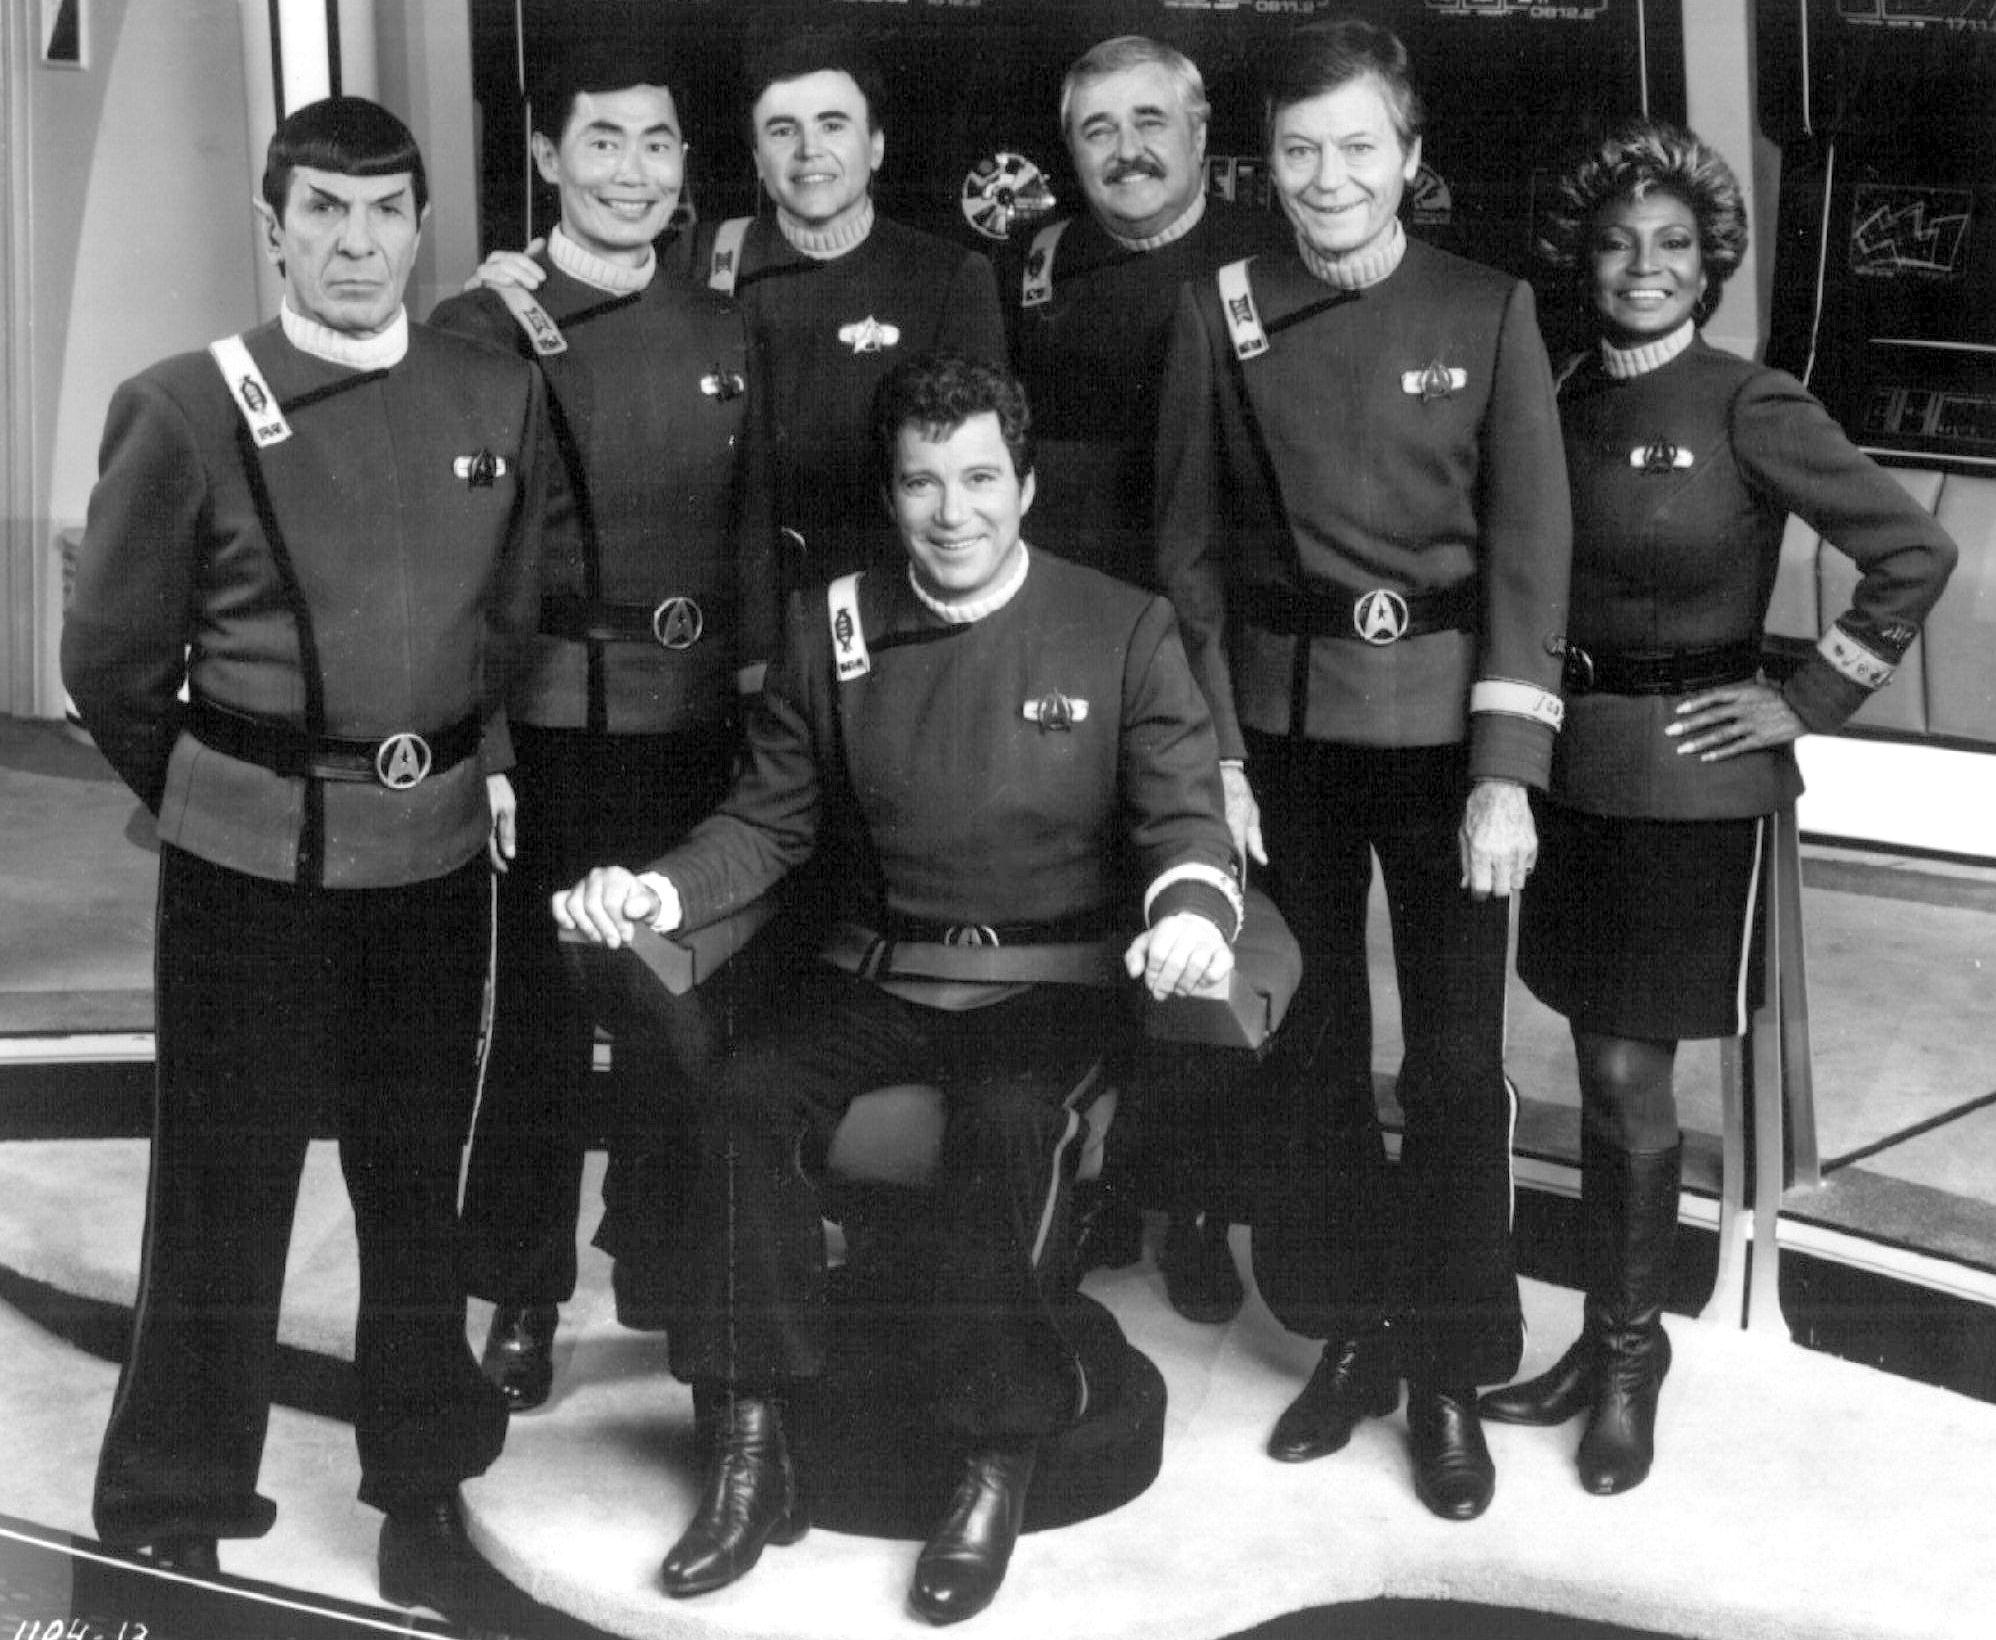 Die alte Star Trek-Crew um Captain James T. Kirk (William Shatner, vorne): (l-r) Mr. Spock (Leonard Nimoy), Sulu (George Takei), Navigator Chekov (Walter Koenig), Chefingenieur Scott (James Doohan),